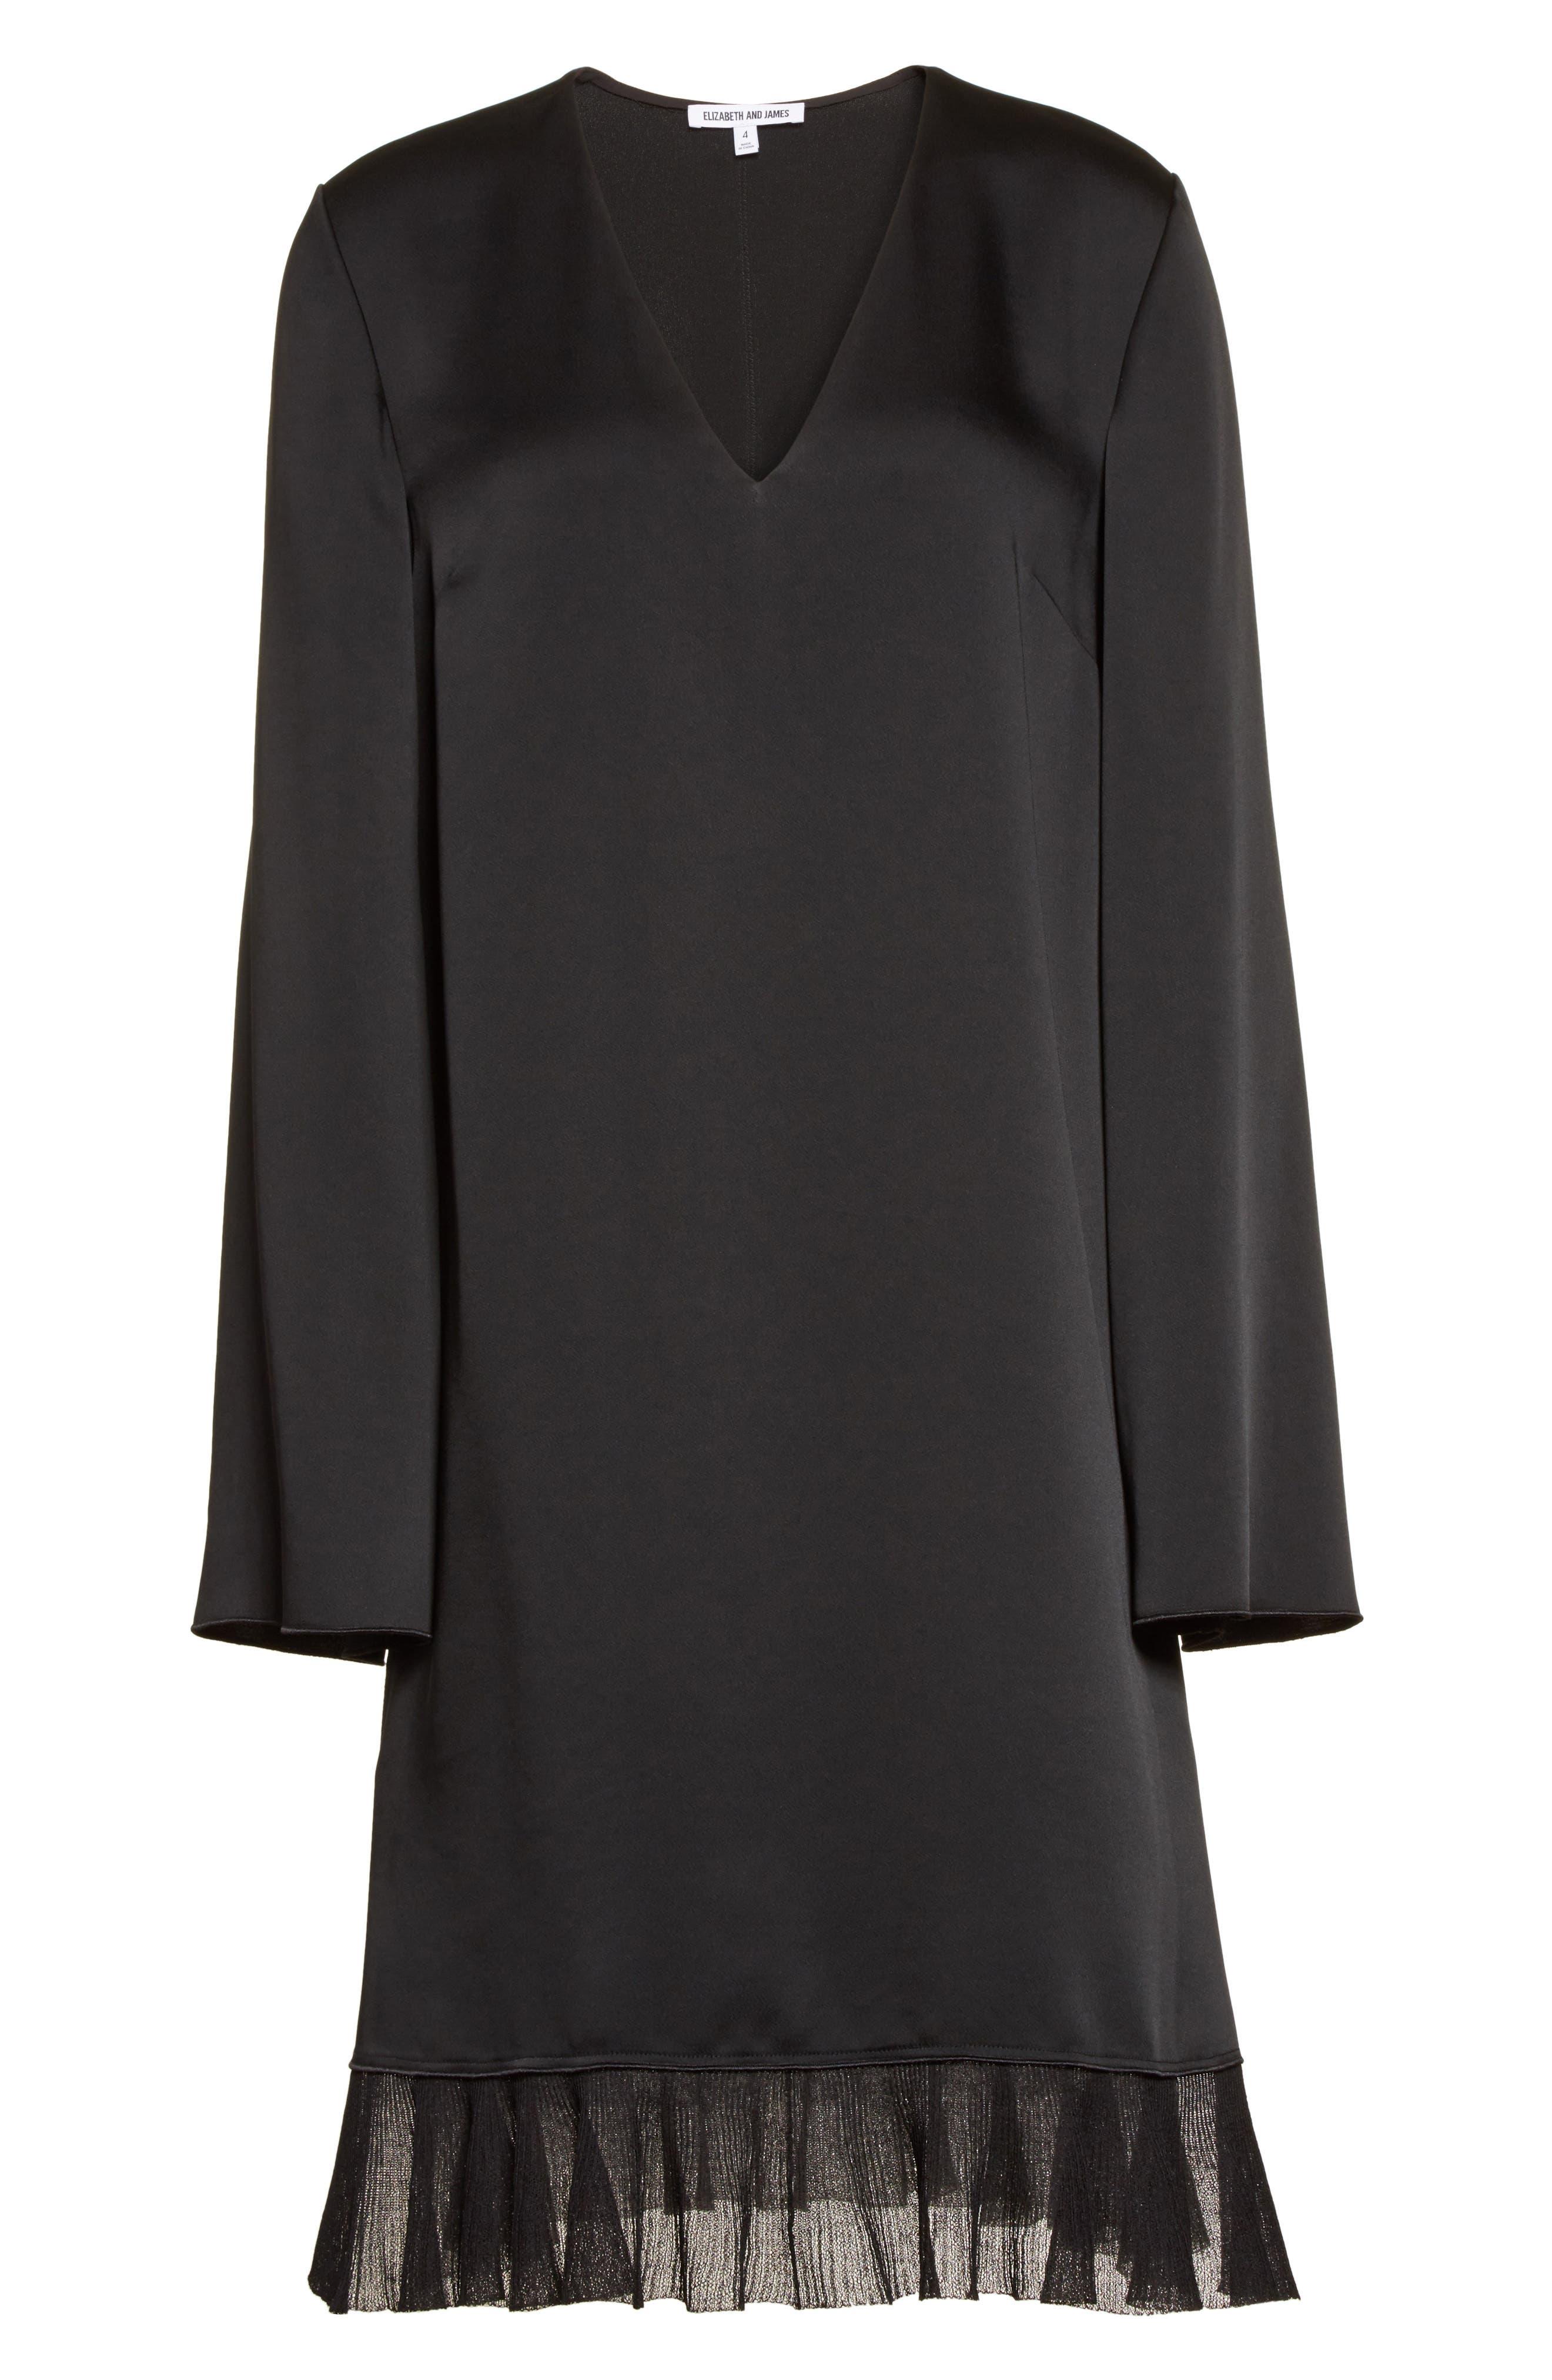 Heath Shift Dress,                             Alternate thumbnail 6, color,                             Black